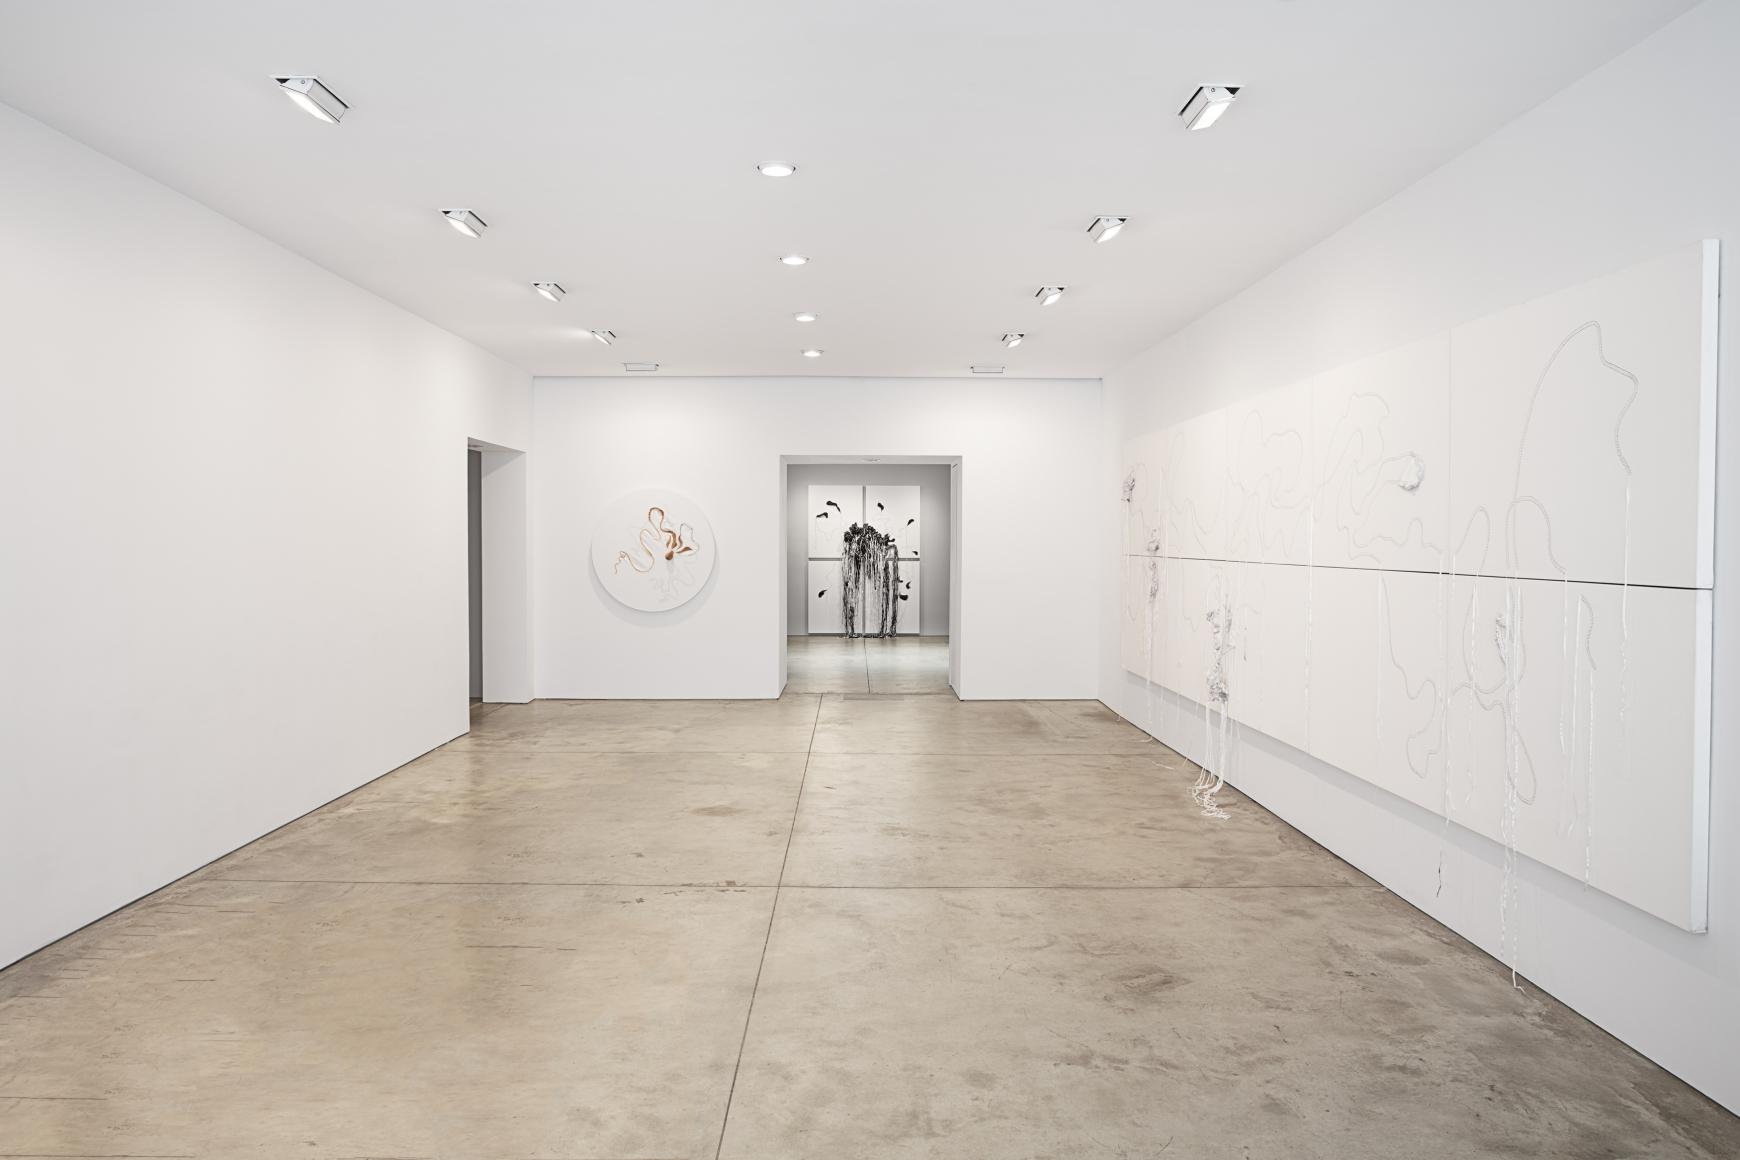 Nicholas Hlobo, Ulwamkelo installation view 1